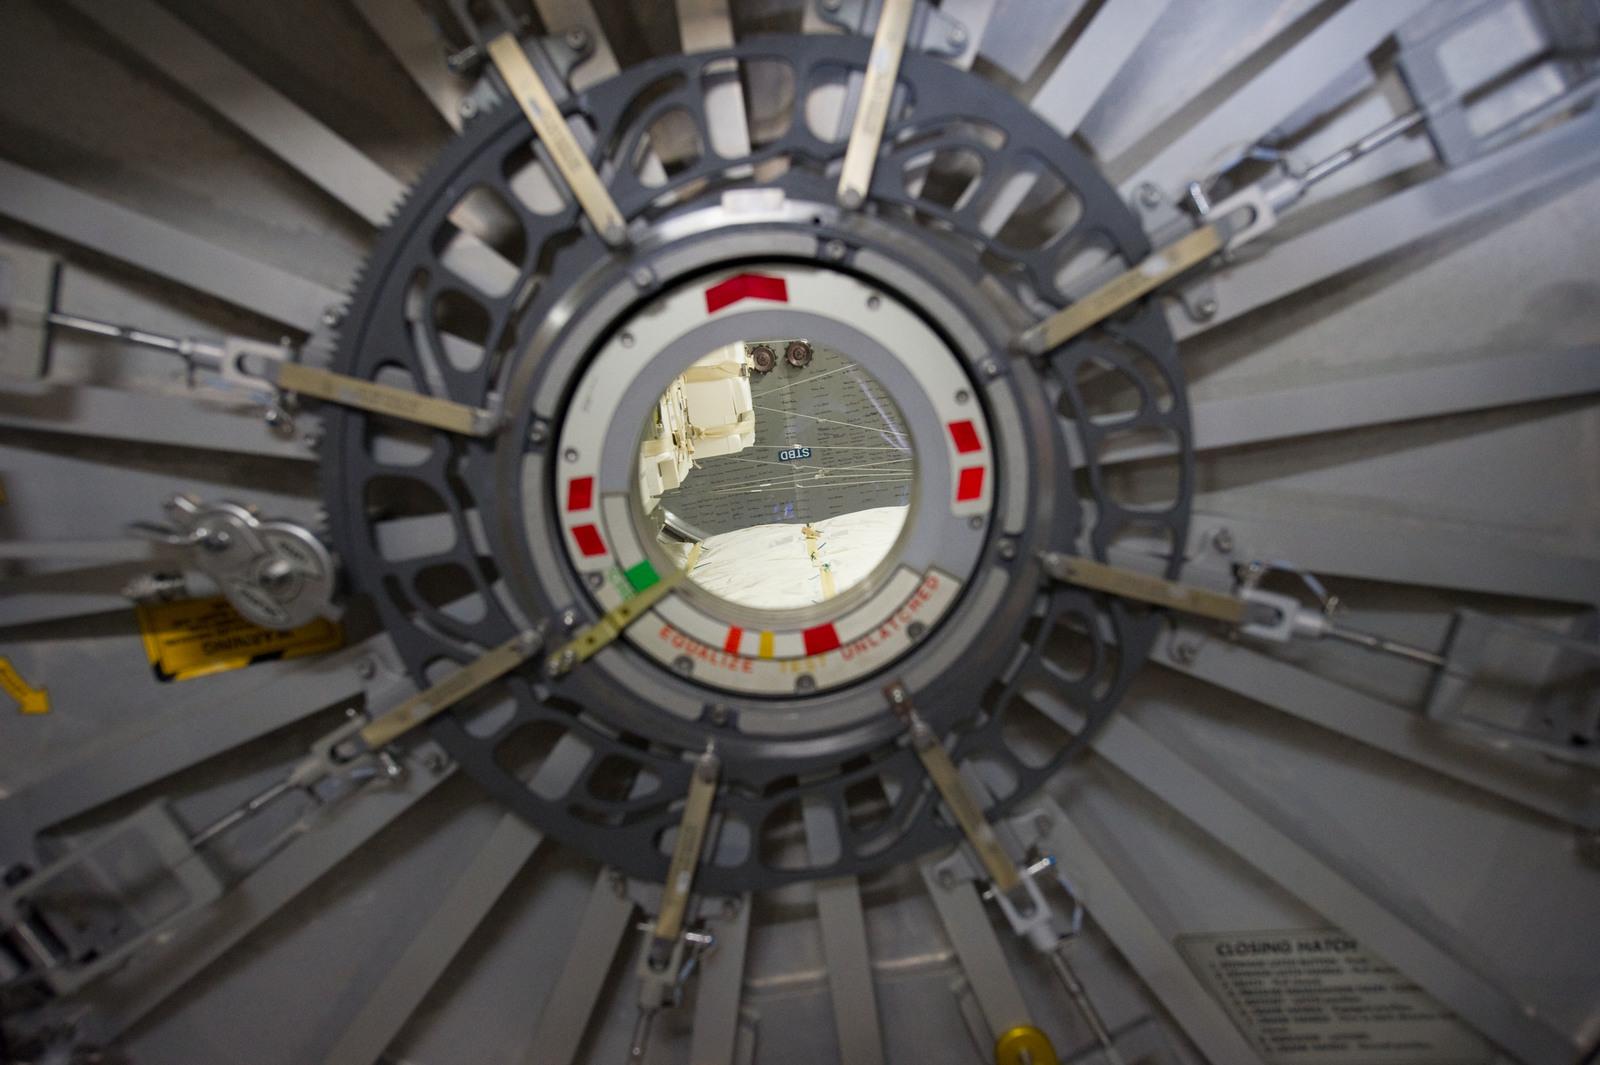 s133E007860 - STS-133 - PMM (Permanent Multipurpose Module) Leonardo hatch